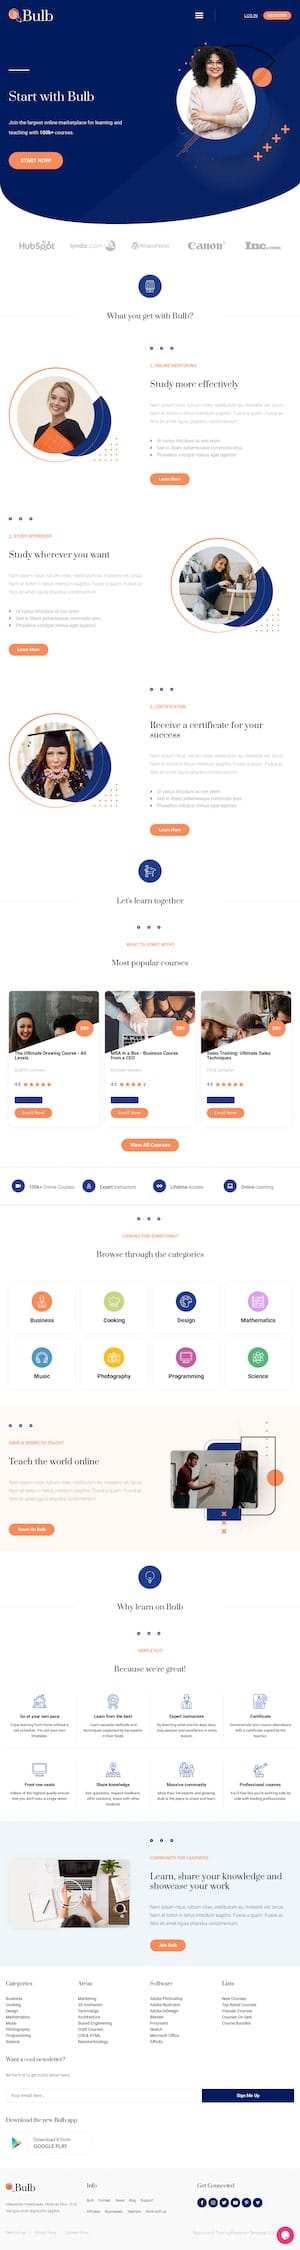 Education & Training - Elementor Template Website - Cloud High Sydney WordPress Websites